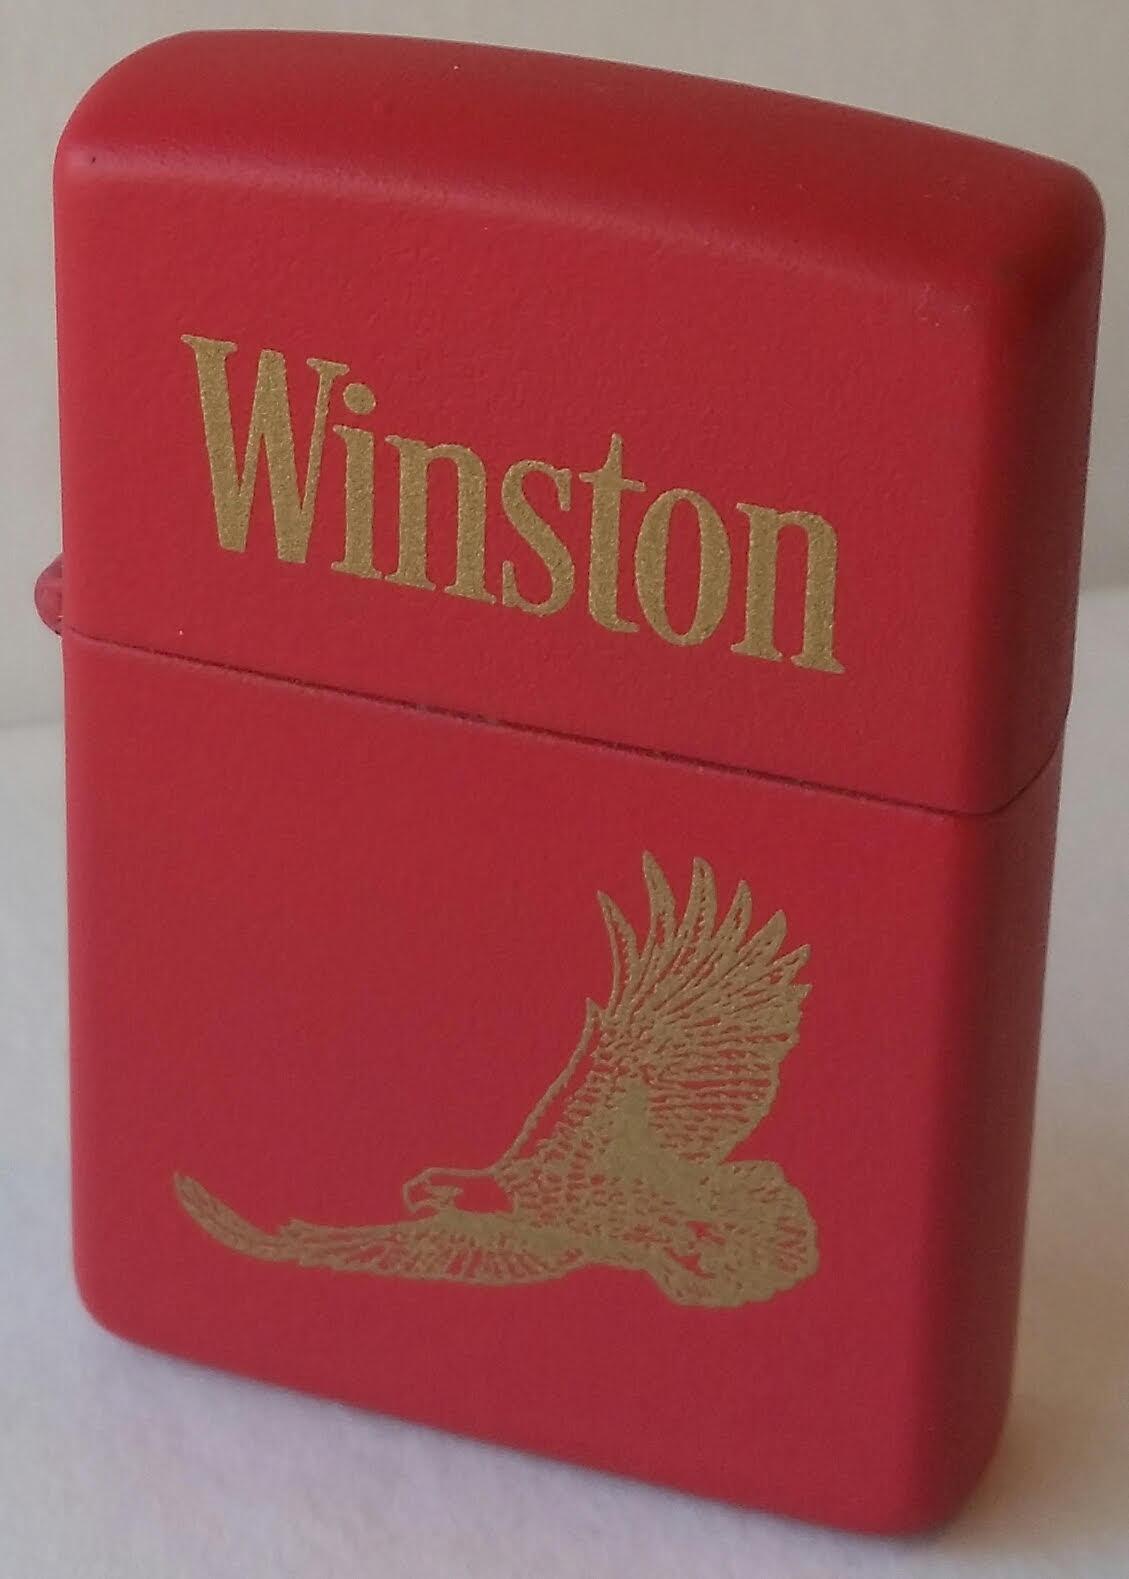 Zippo Lighter Winston Tobacco Red Prototype RARE RJR CAMEL NEW 1996